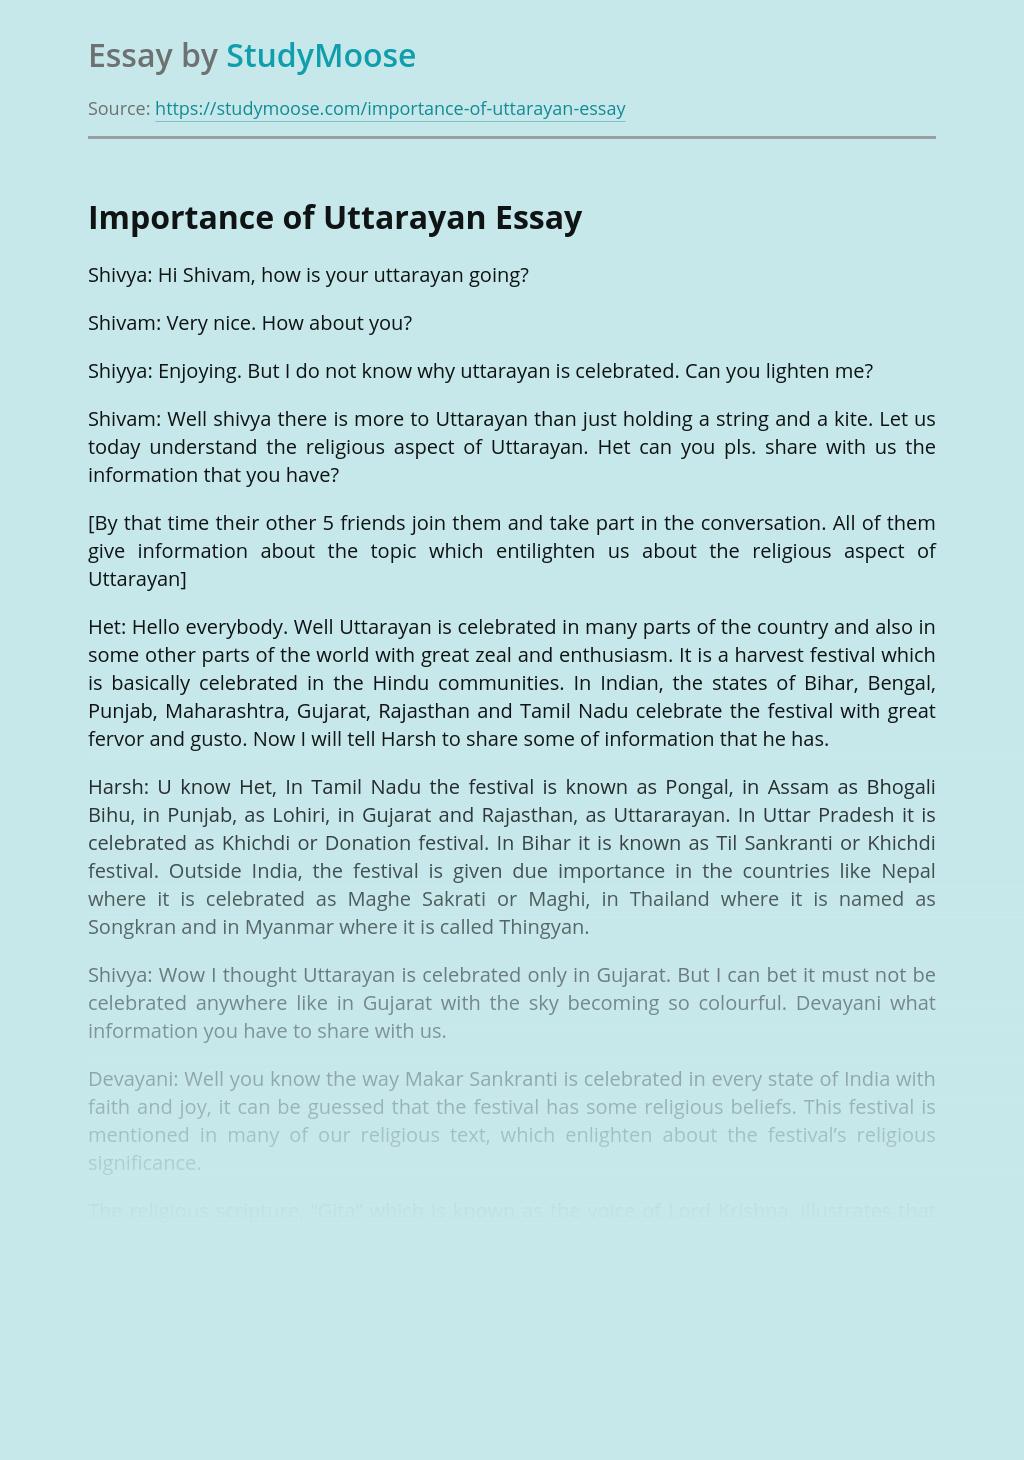 Rhetoric Dialogue on Importance of Uttarayan